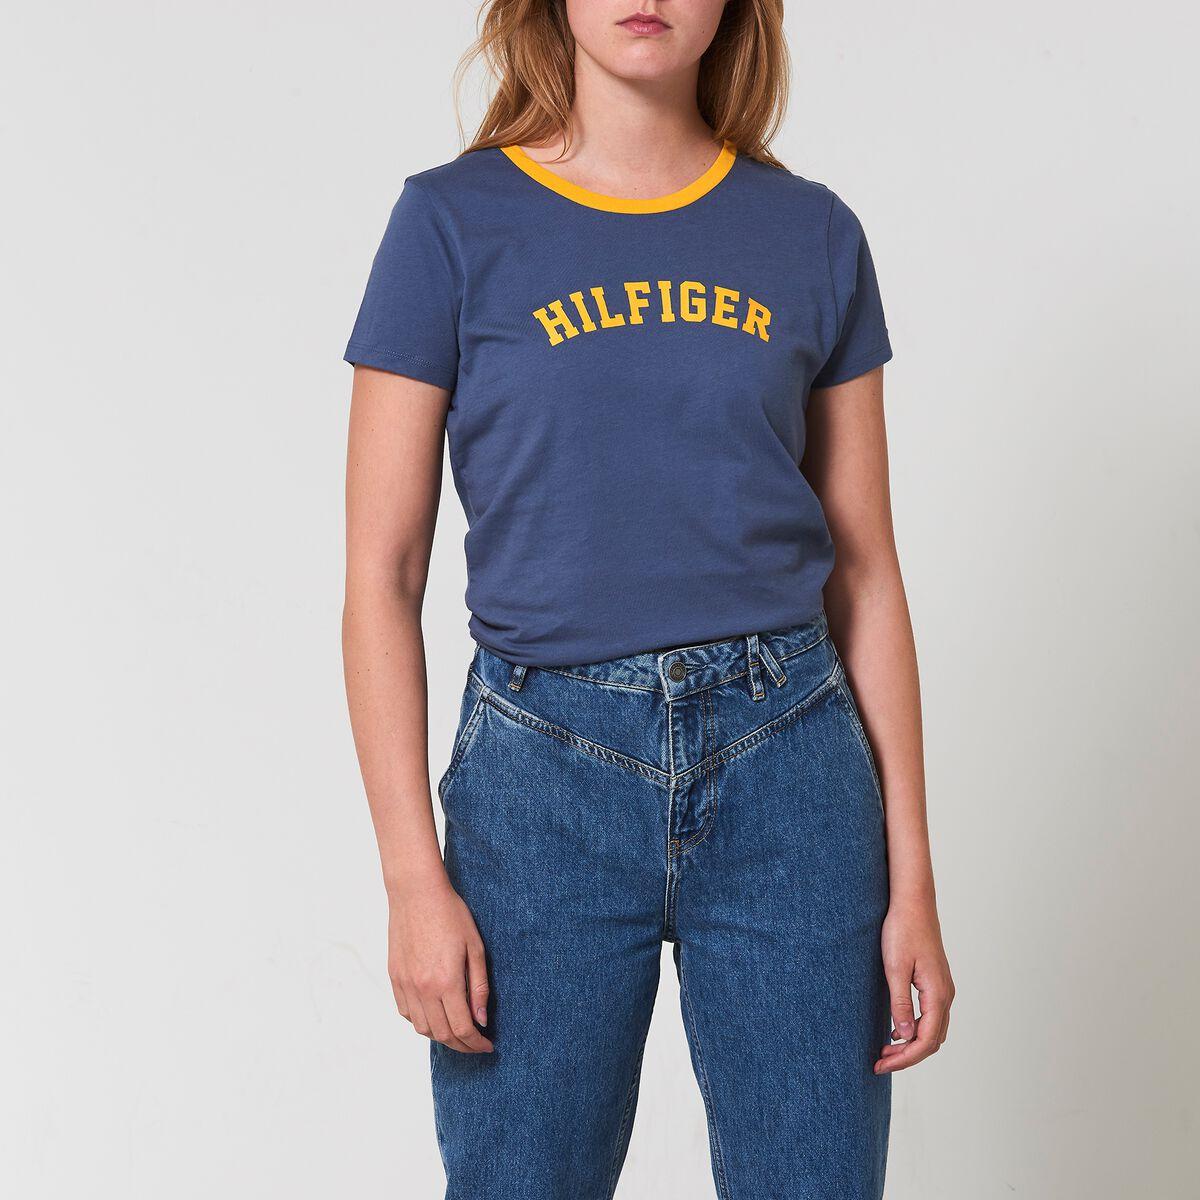 a5dec6090 Women T-shirt Tommy Hilfiger Blue Buy Online